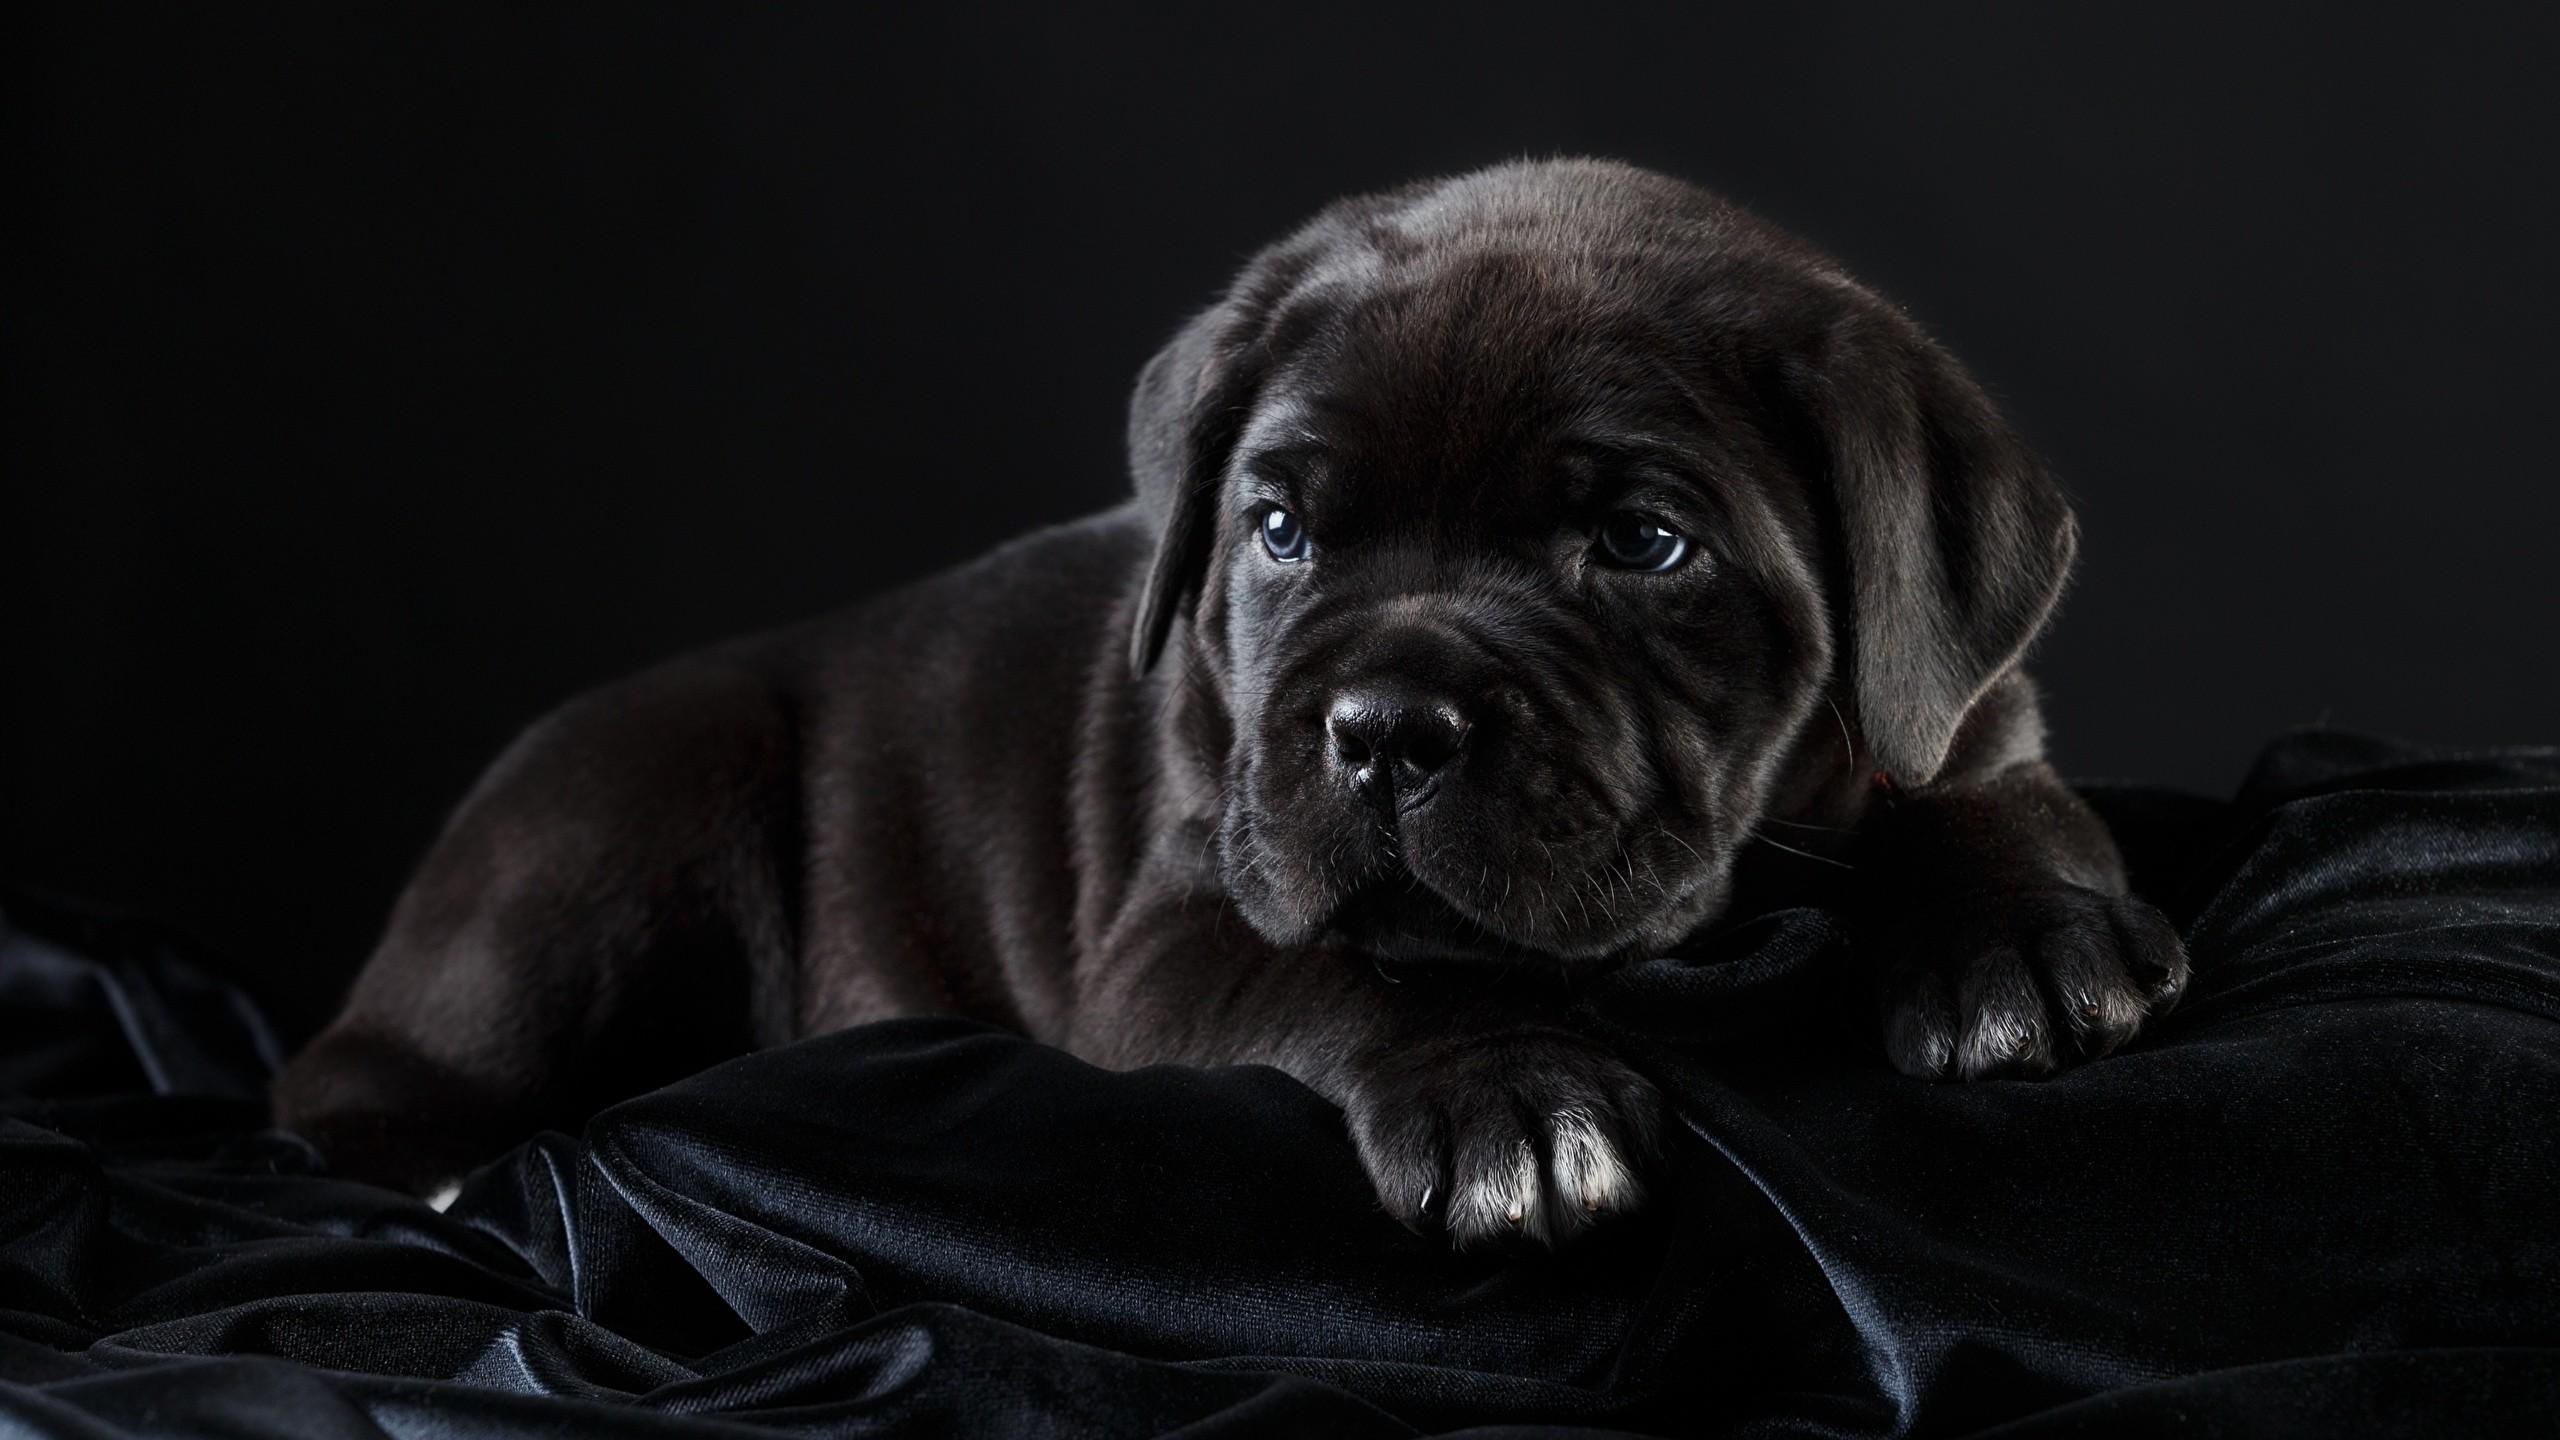 Image Puppy Cane Corso Dogs Black Animals Black background 2560×1440